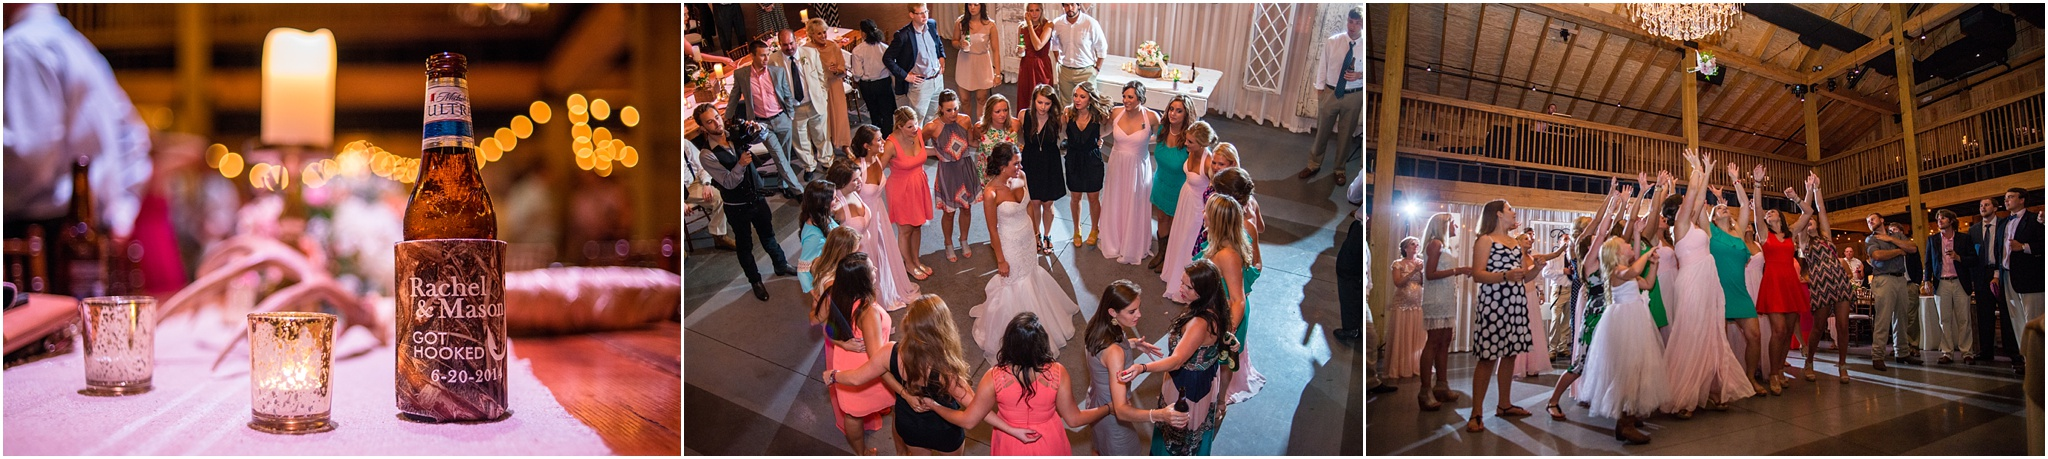 Greg Smit Photography Nashville wedding photographer Mint Springs Farm 25